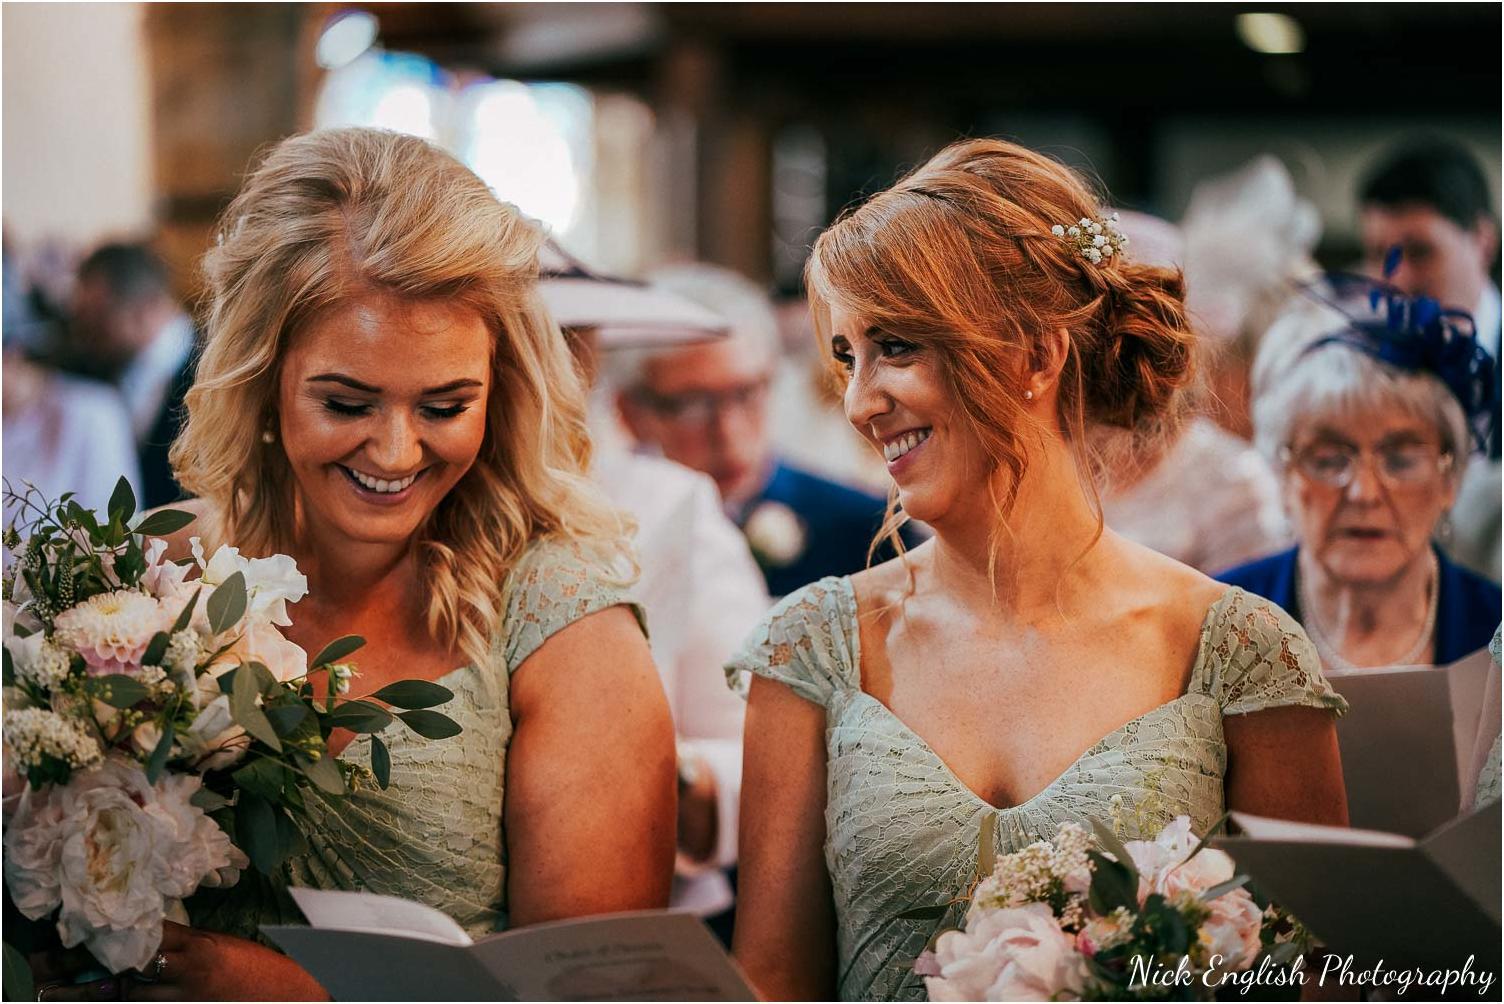 Mitton_Hall_Wedding_Photographer-53.jpg